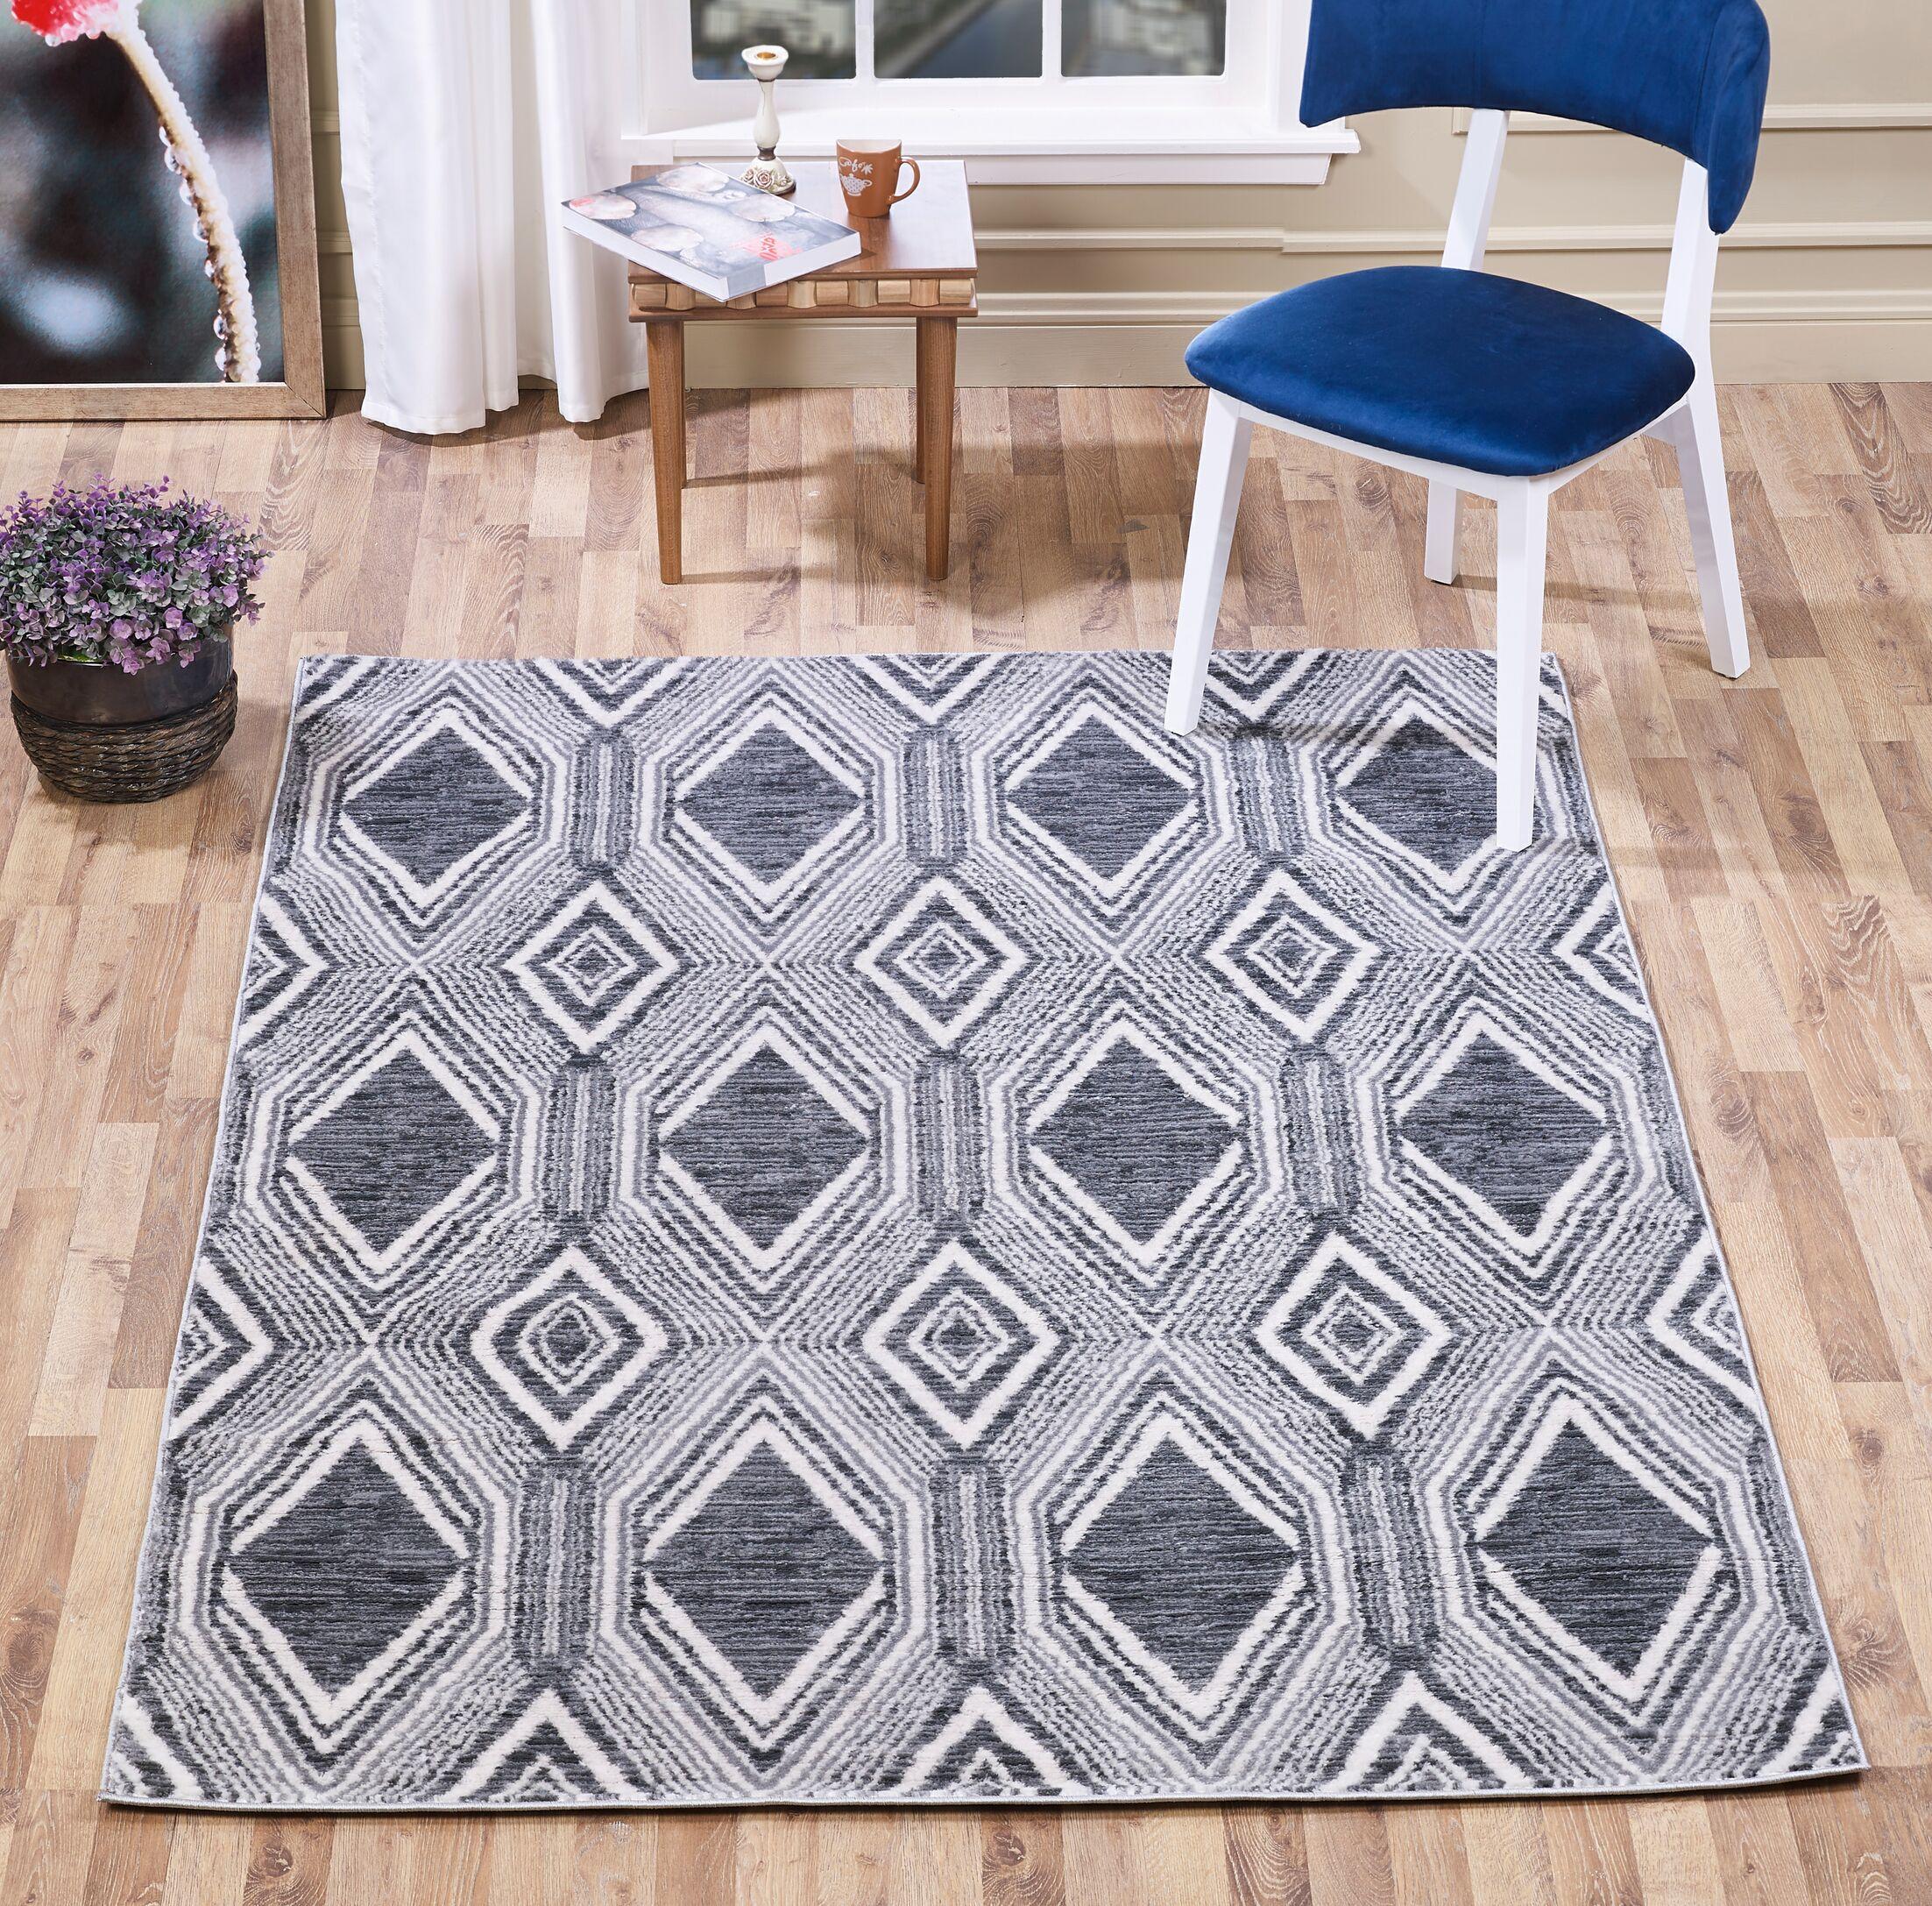 Gauna Ikat Gray Area Rug Rug Size: Rectangle 5' x 7'